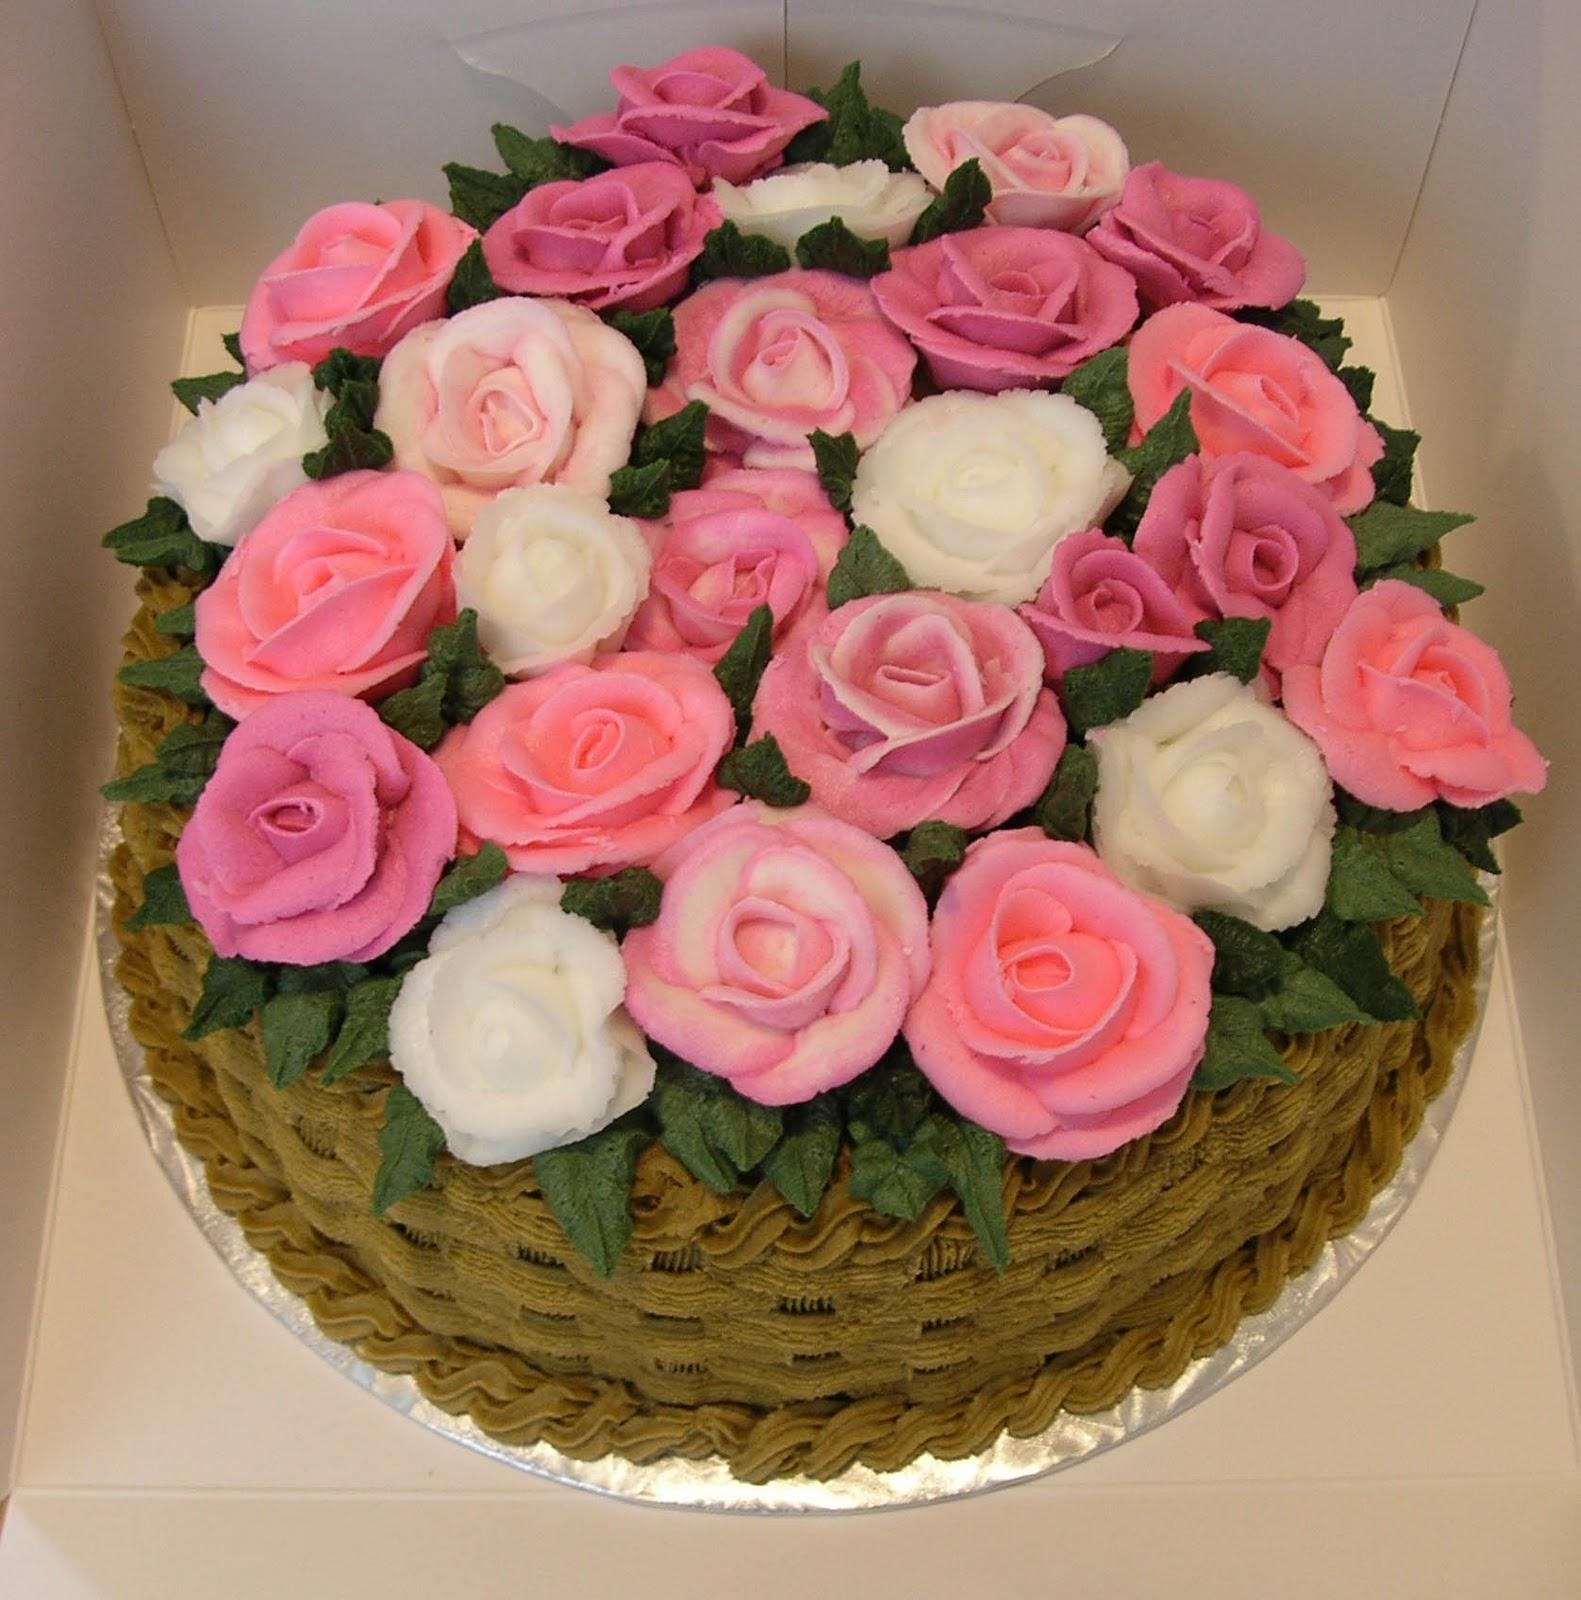 The Artsy Blogger Cakes